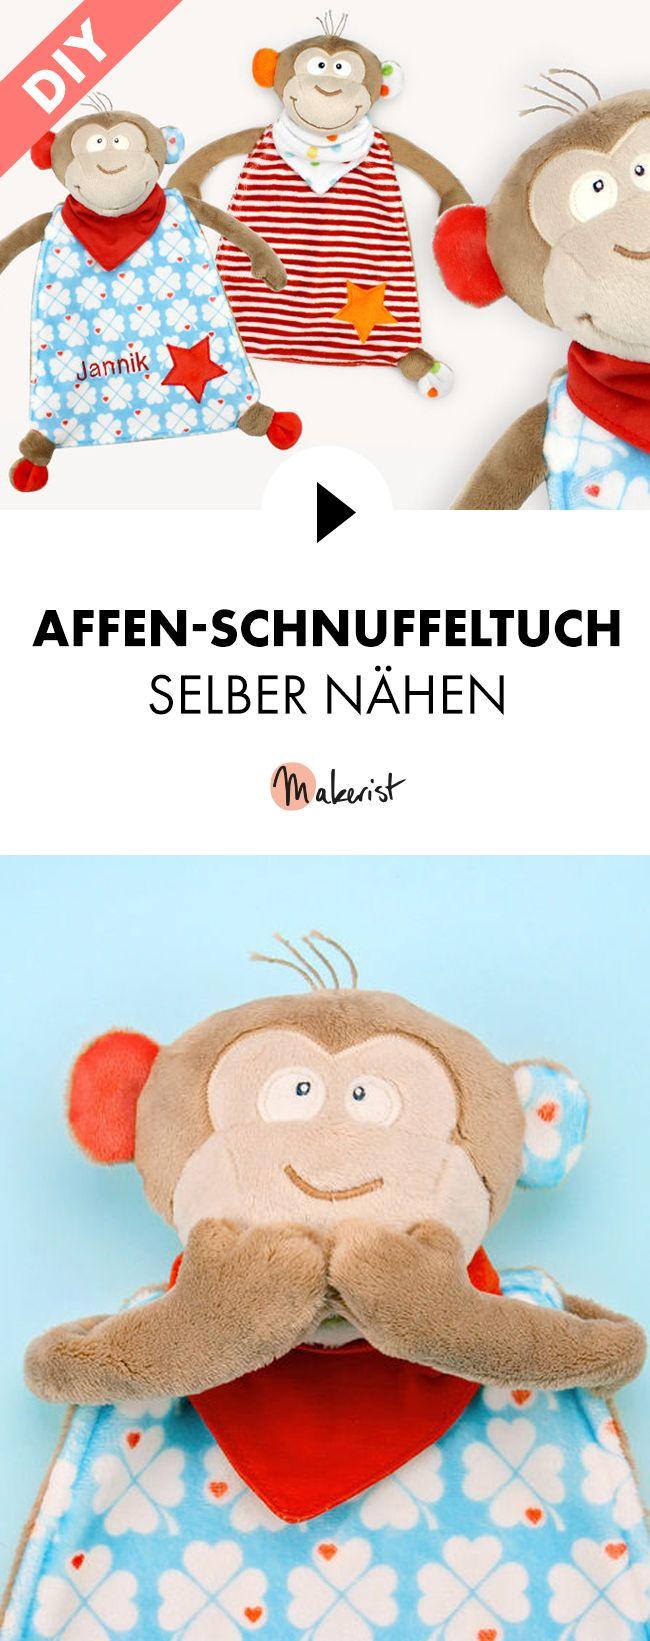 18 best Plüschstoffe ✁ images on Pinterest | Pillows, Beige and ...